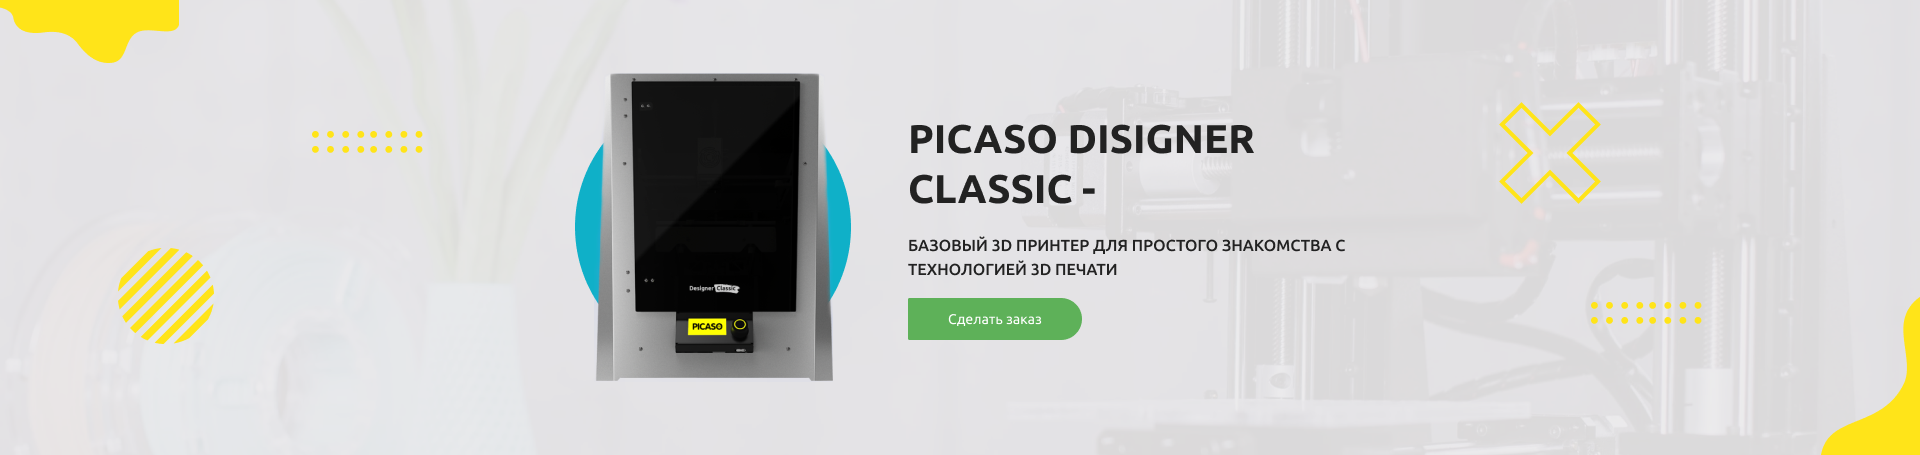 Picaso Disagner Classic